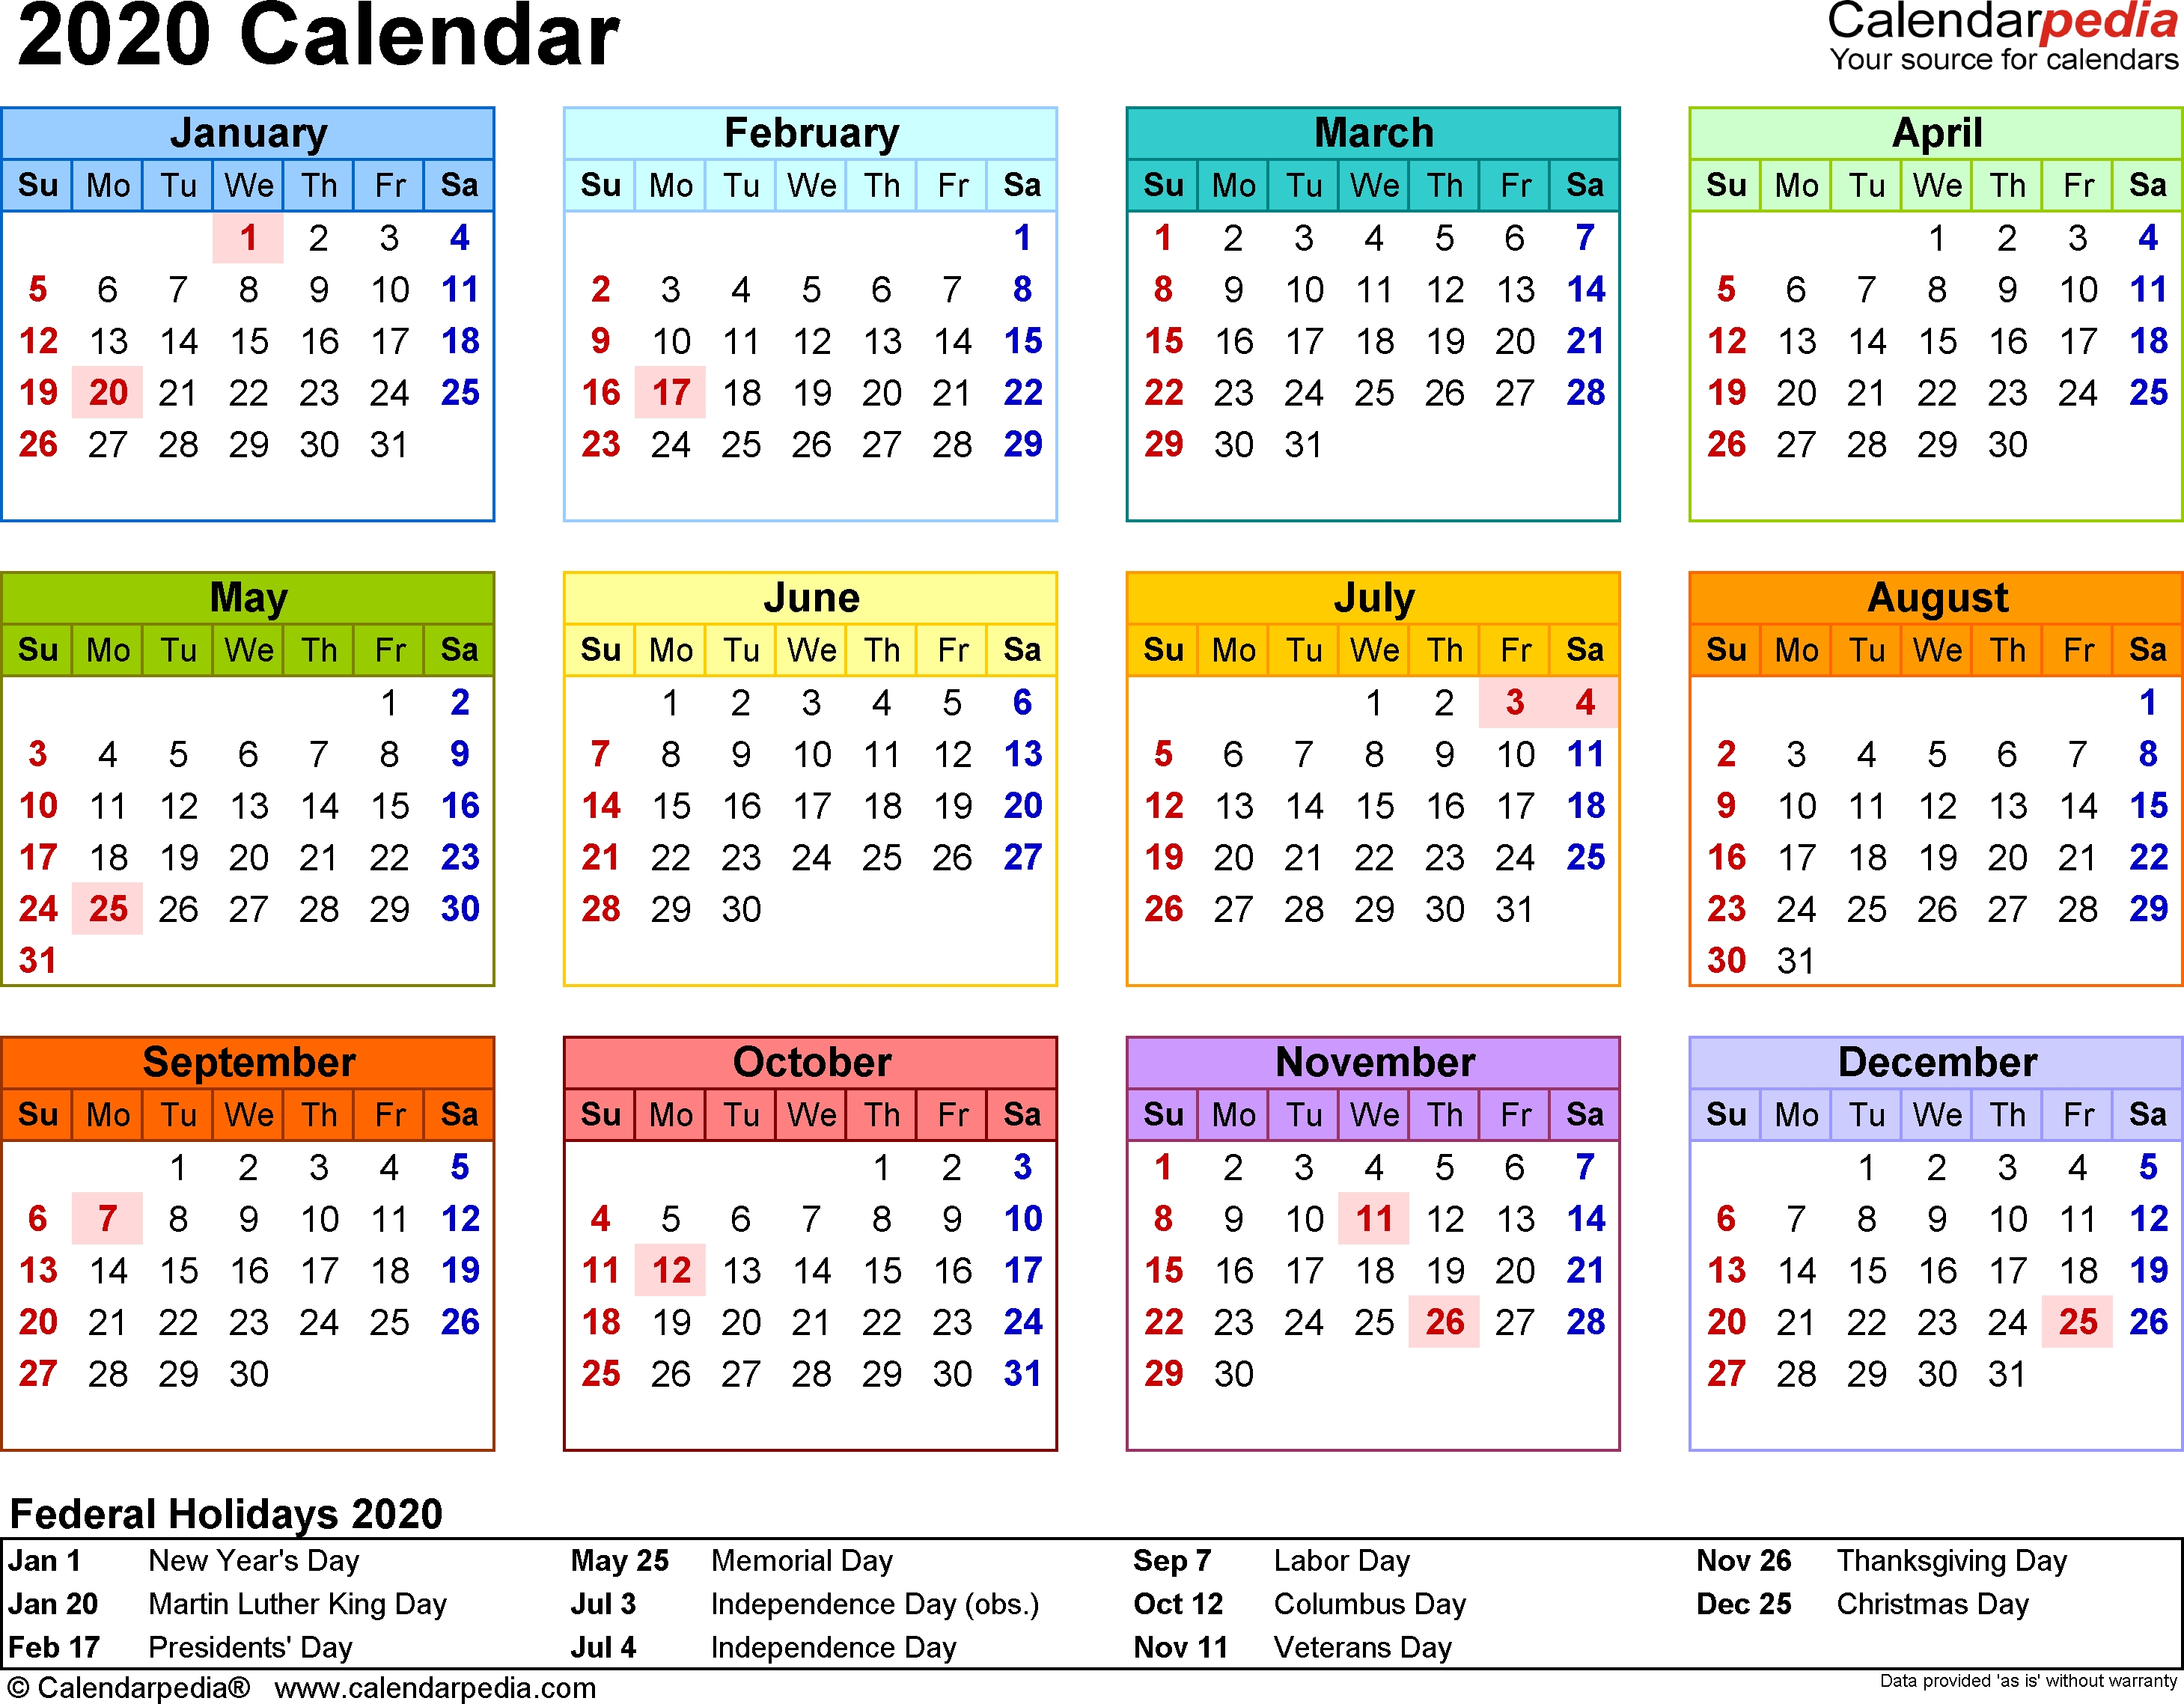 2020 Calendar Pdf - 18 Free Printable Calendar Templates-Indesign Calendar Template 2020